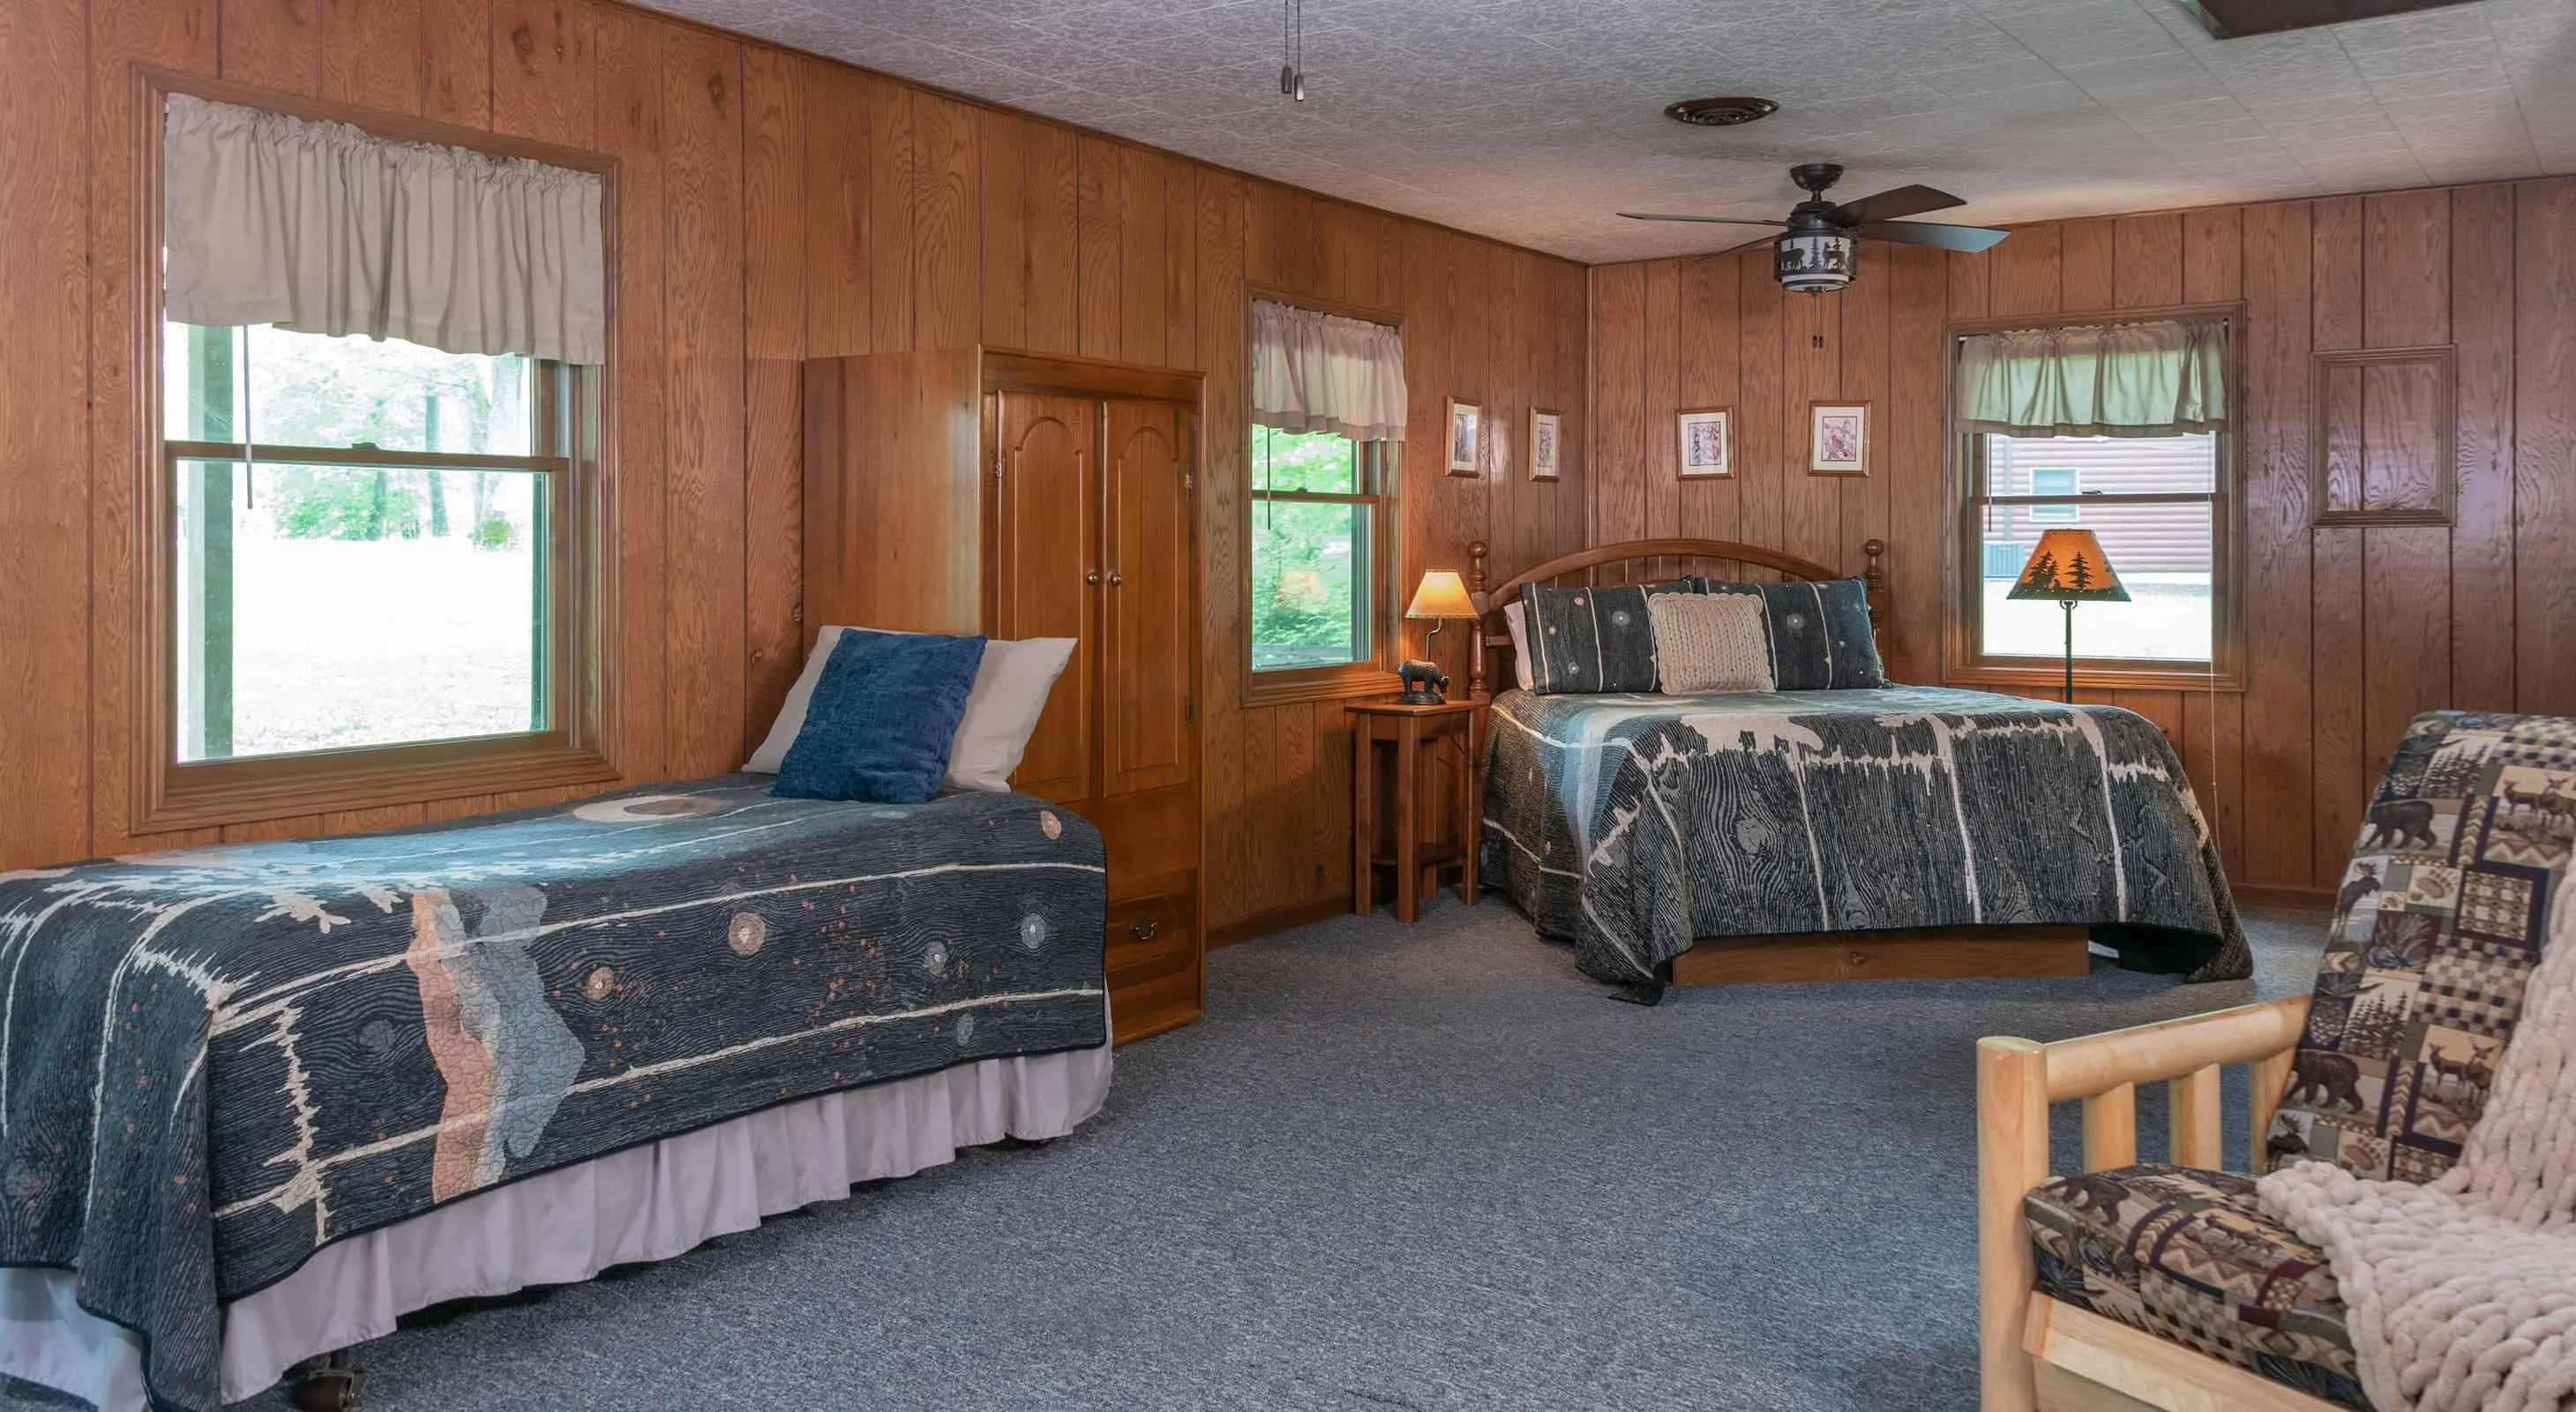 Osage Cabin beds - weekend getaway near Chicago